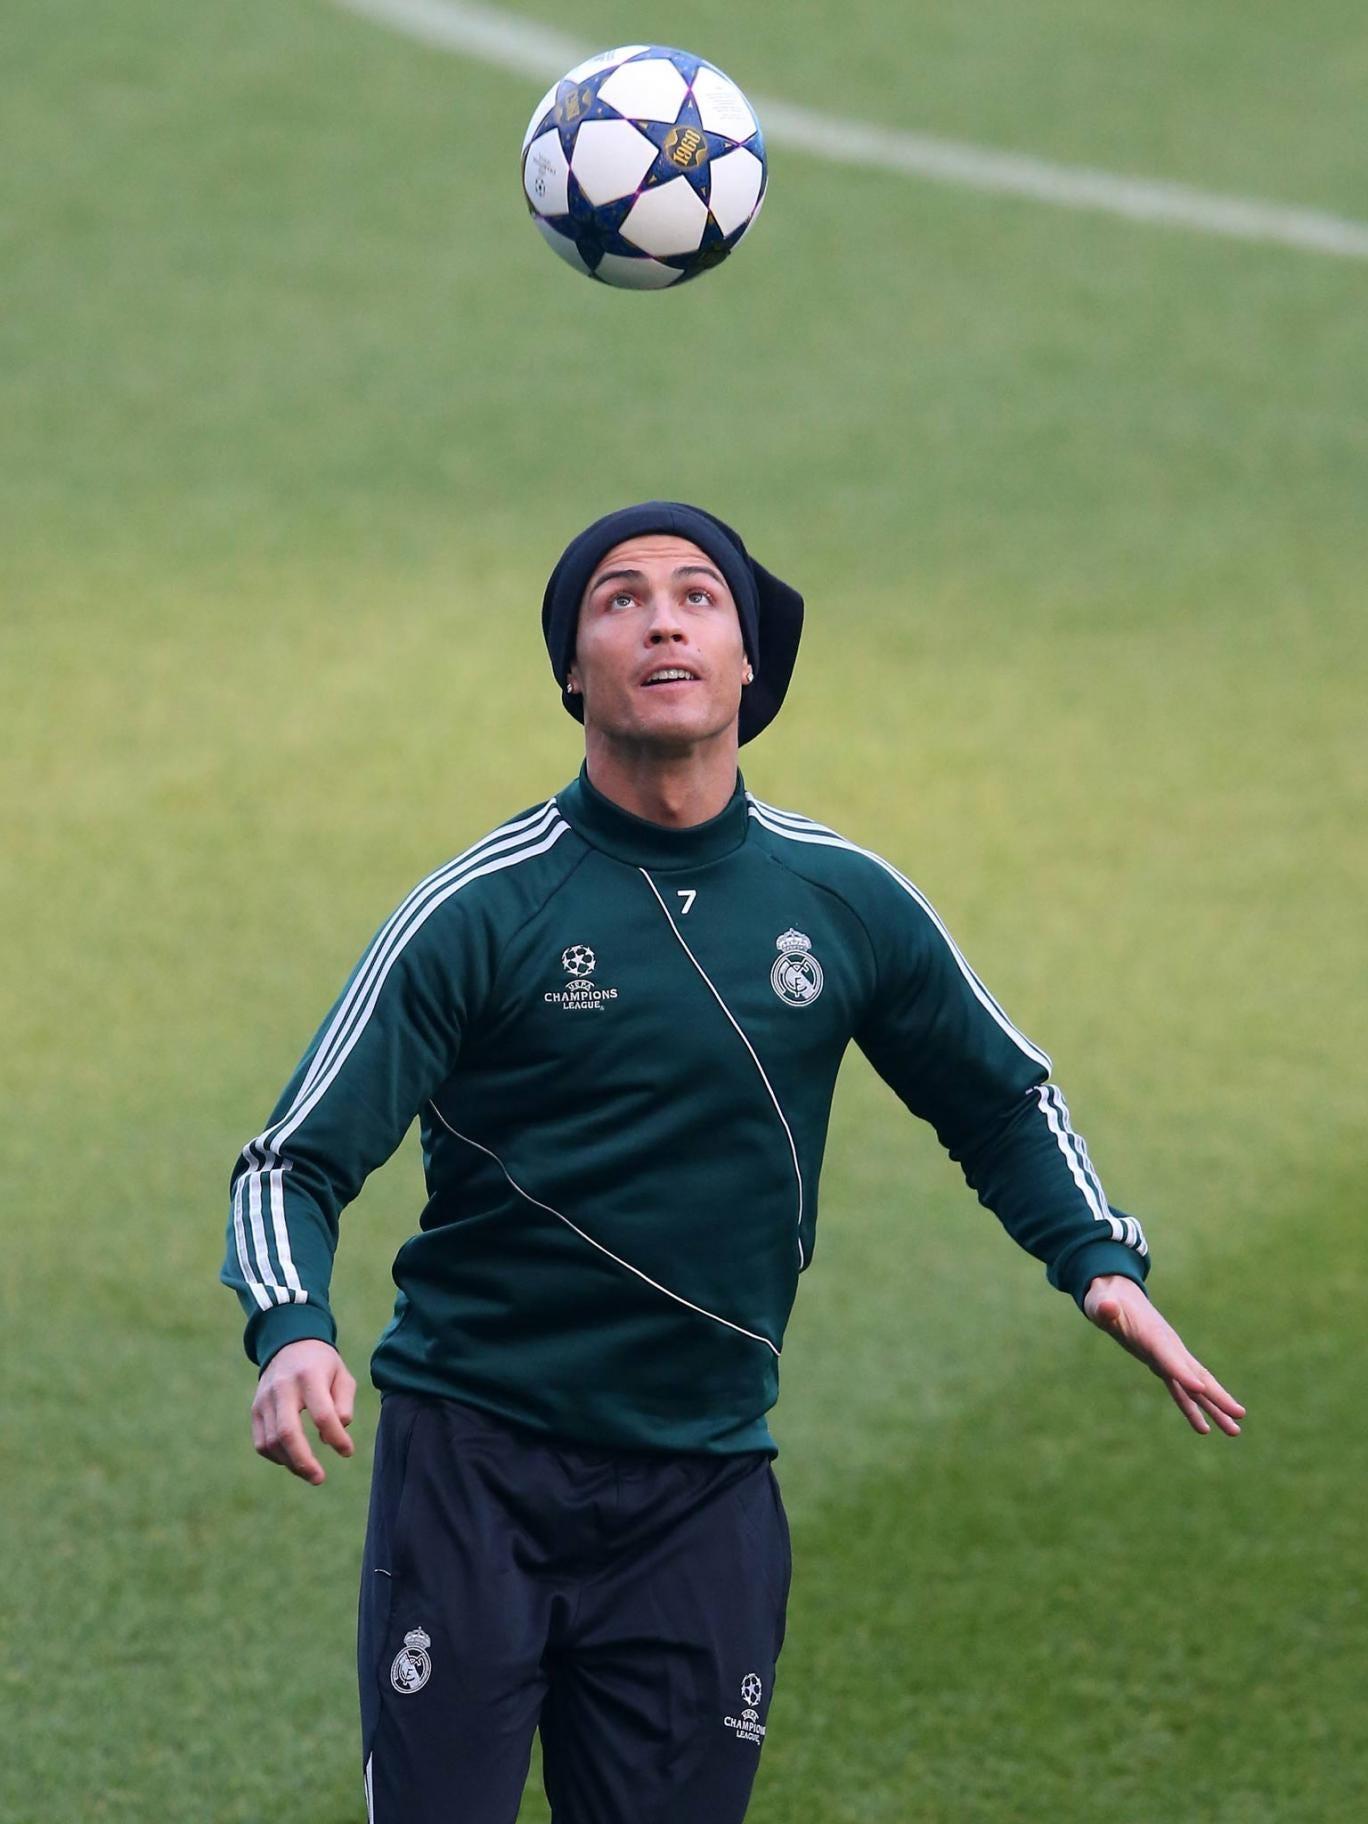 Cristiano Ronaldo at the Etihad Stadium